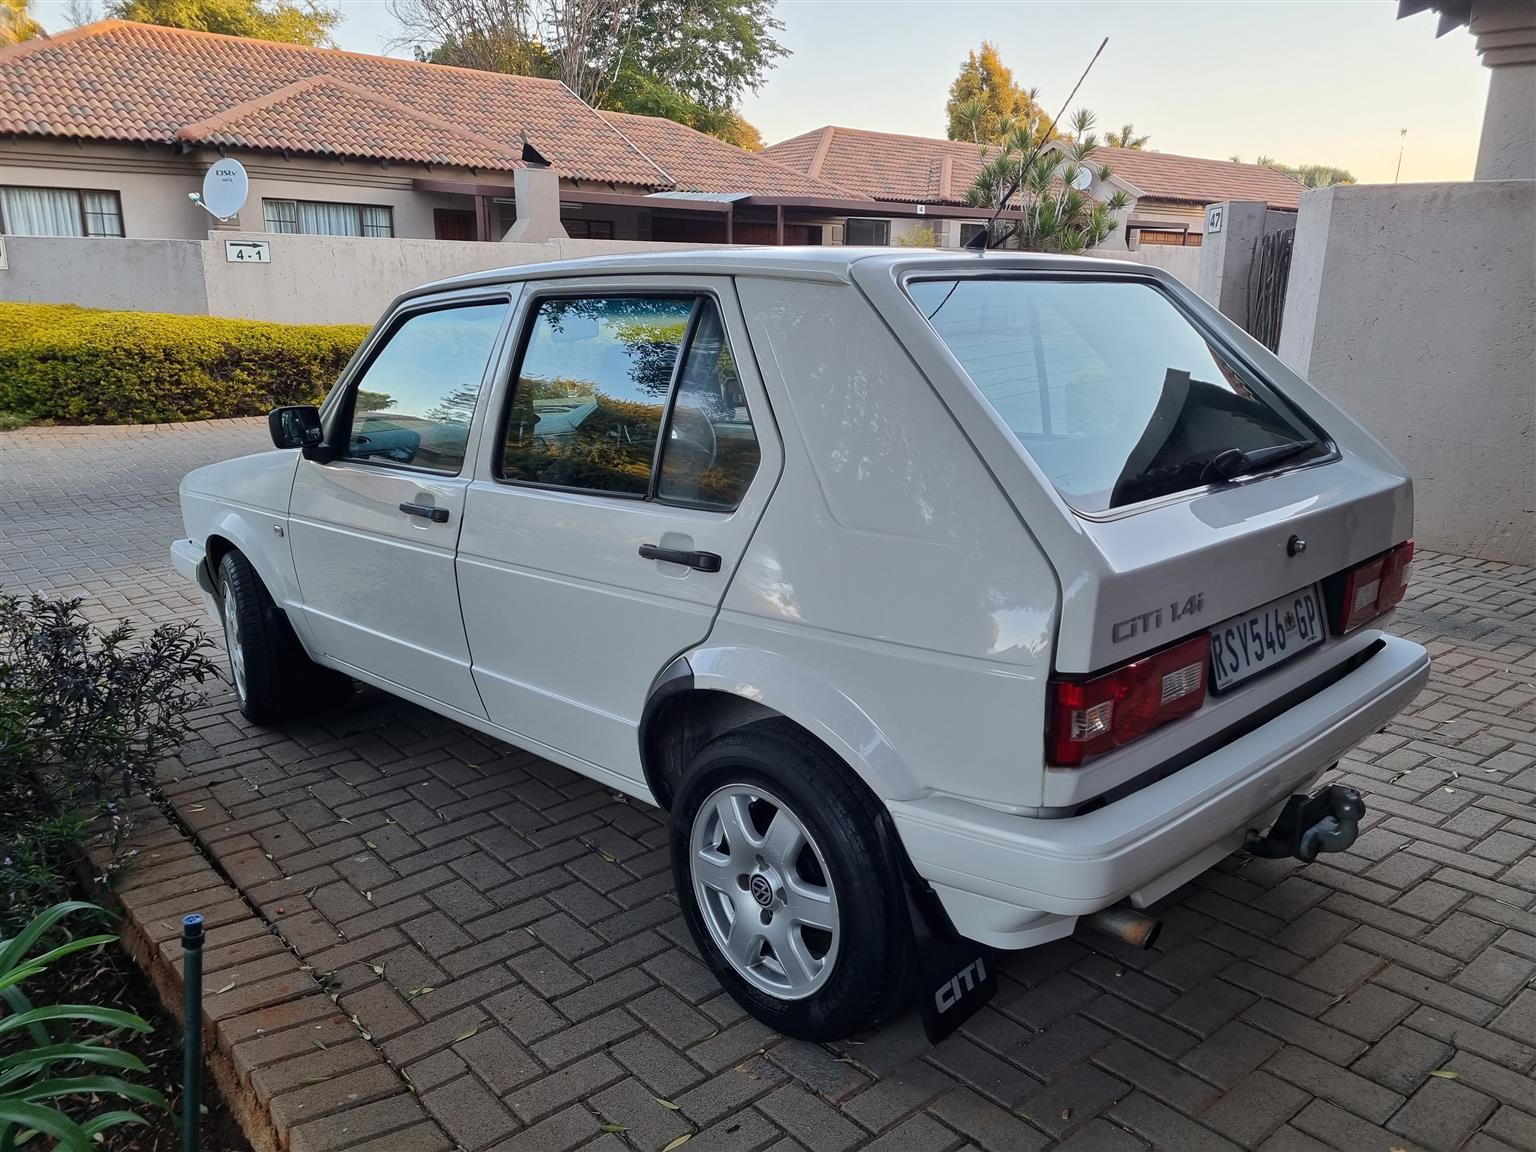 2004 VW Citi 1.4i Golf For Sale!